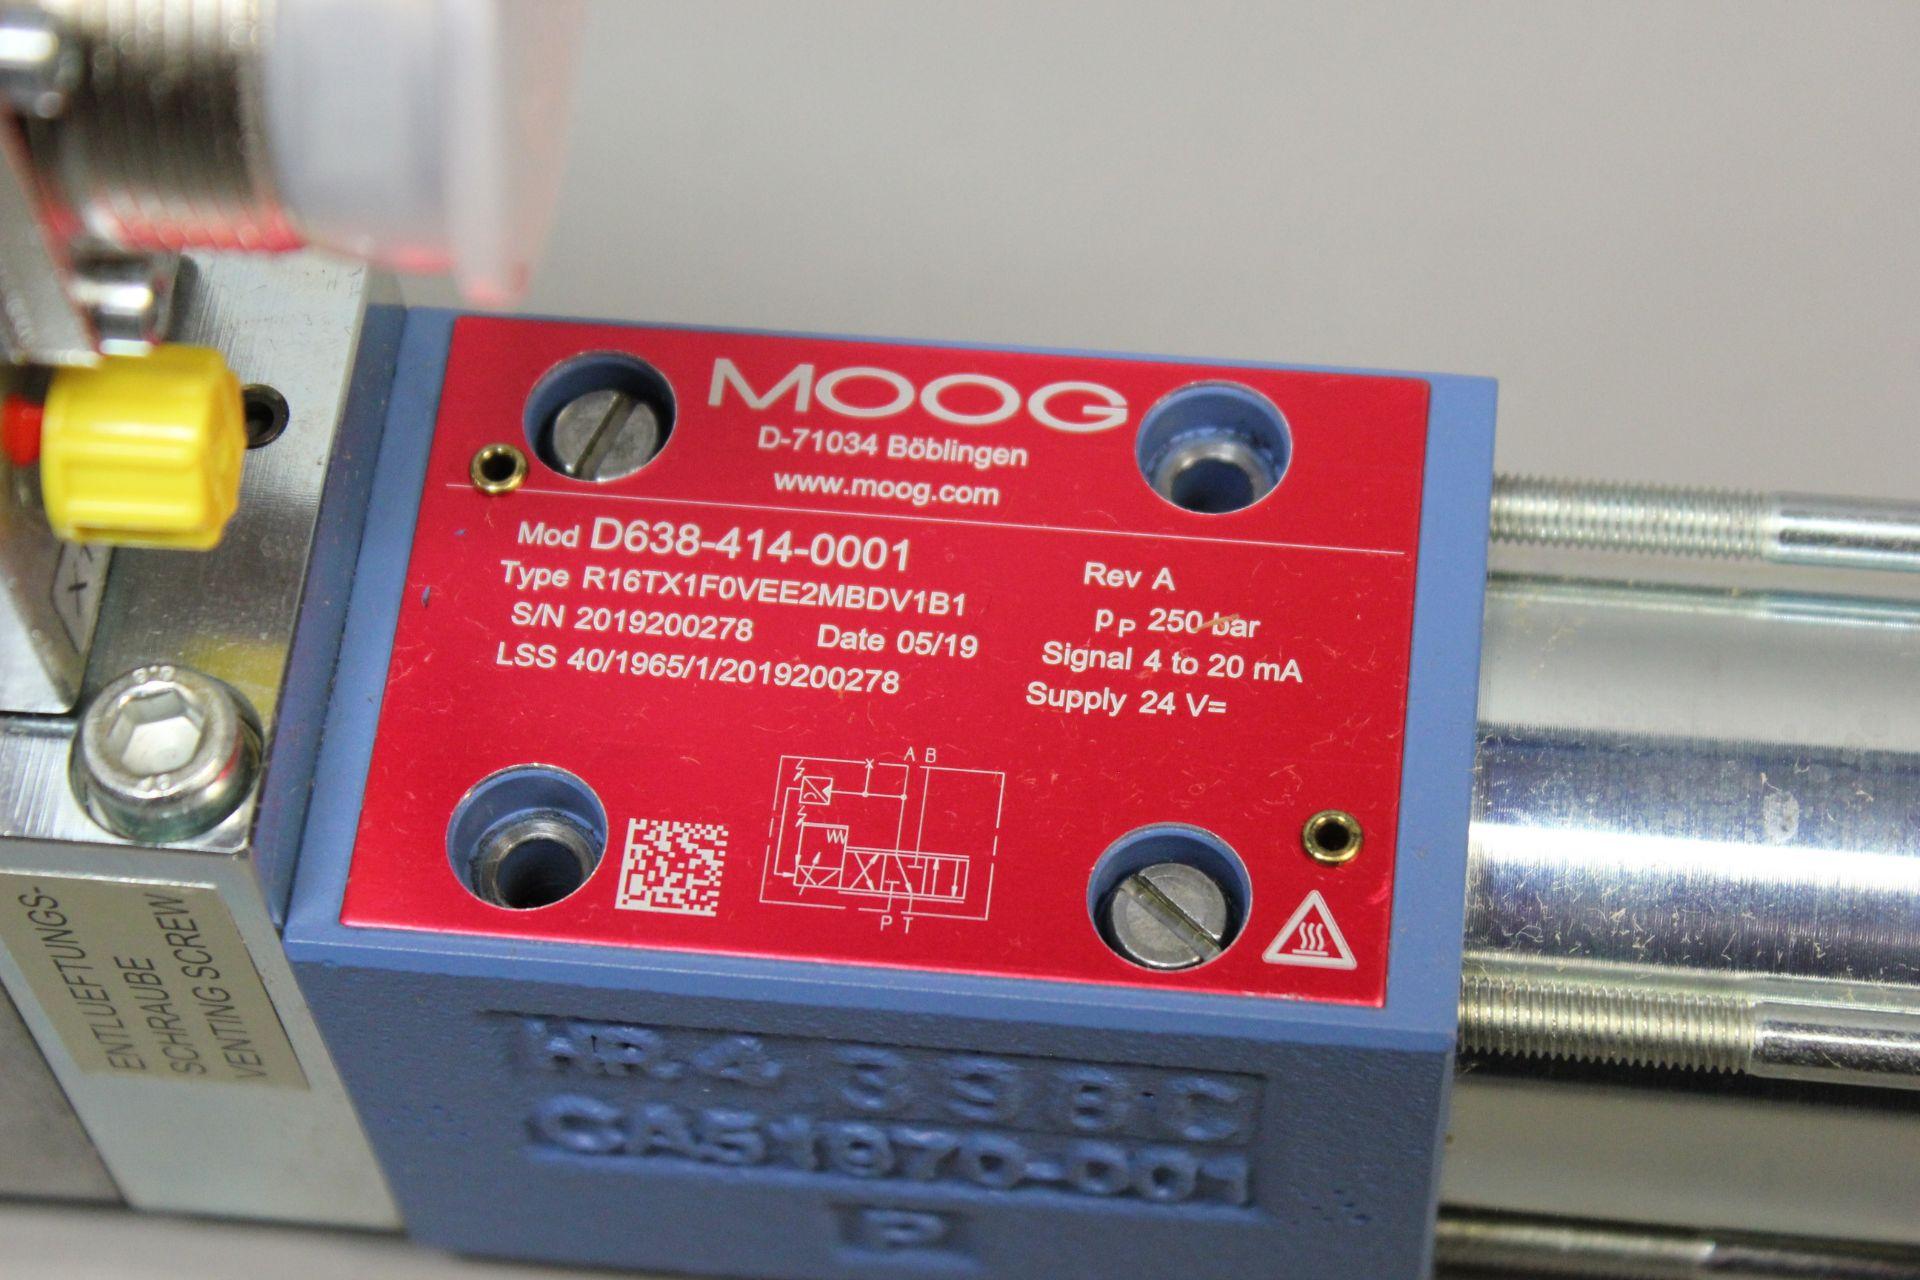 NEW MOOG DIRECT DRIVE DIGITAL CONTROL HYDRAULIC SERVO VALVE - Image 6 of 12